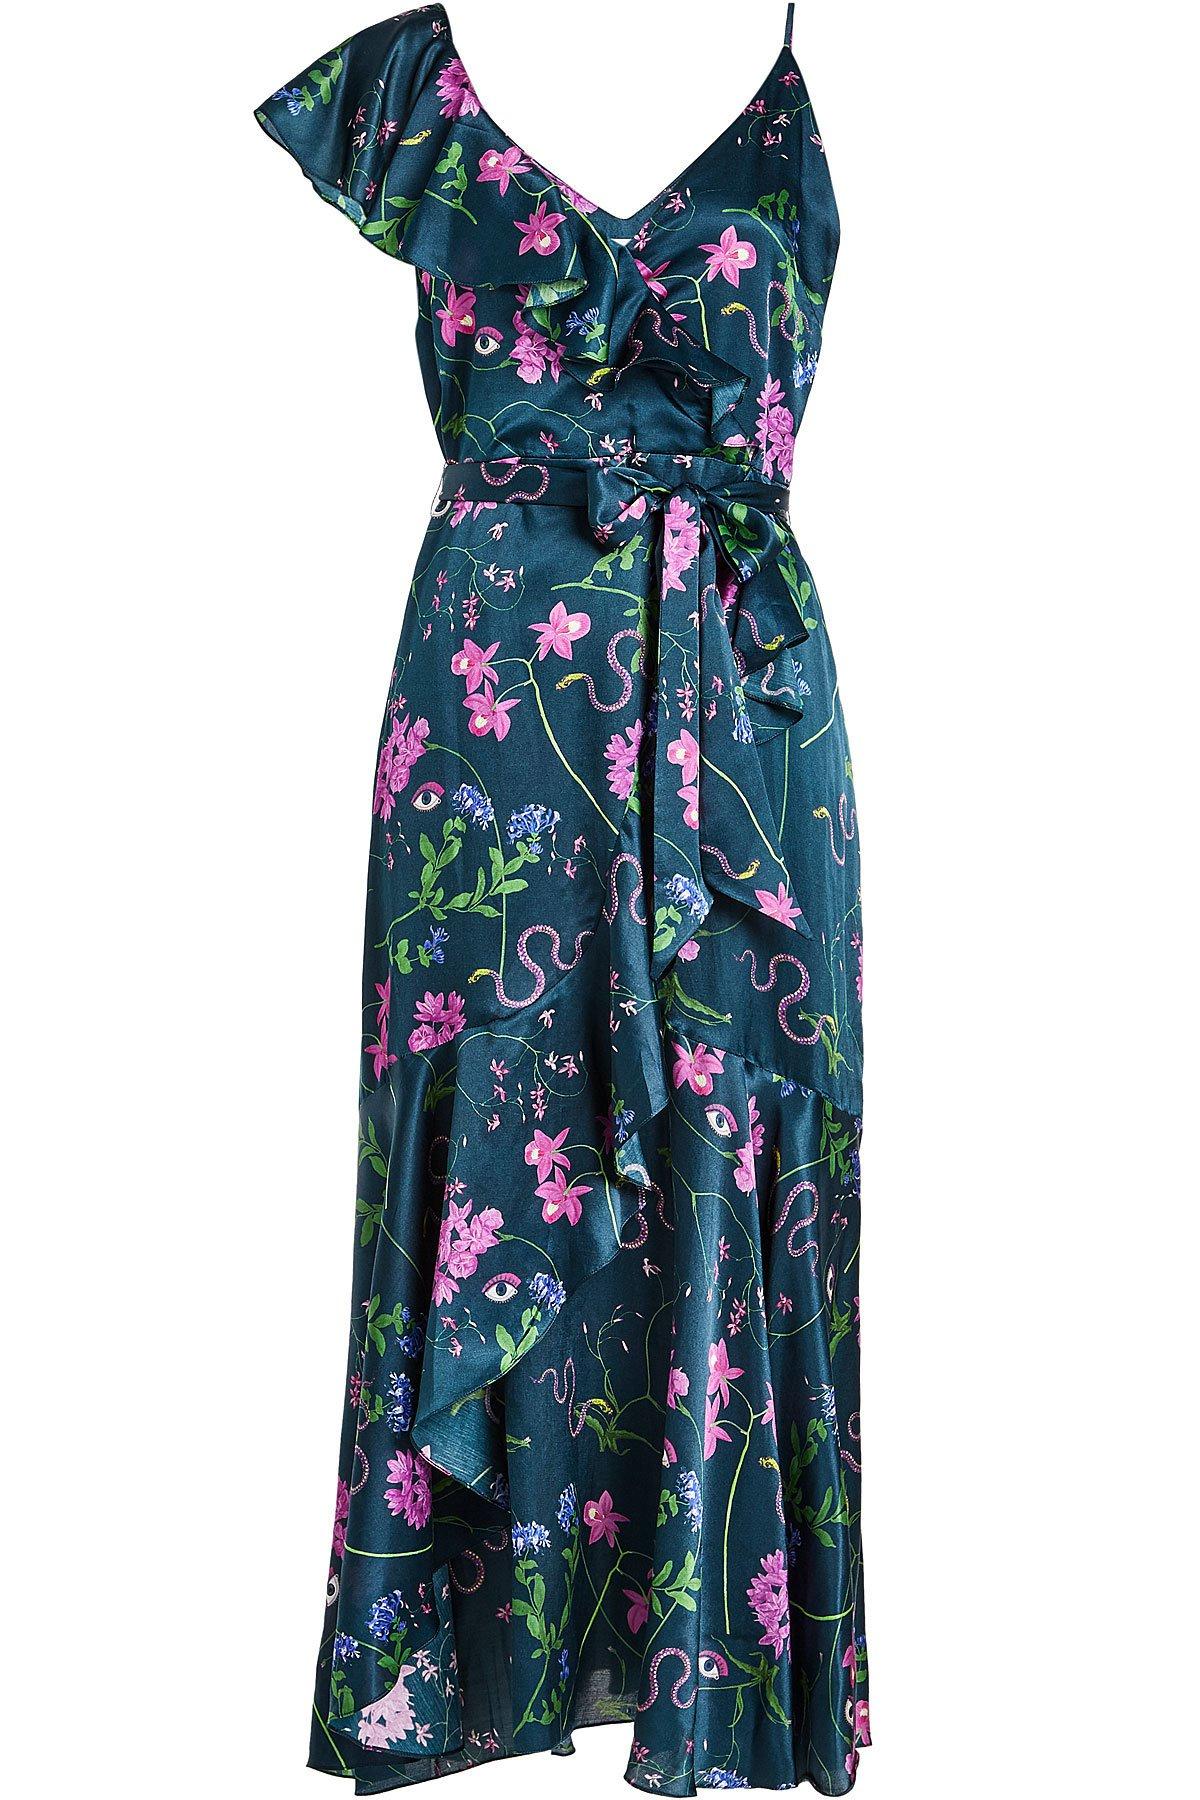 Floral Print Wrap Dress Gr. UK 6